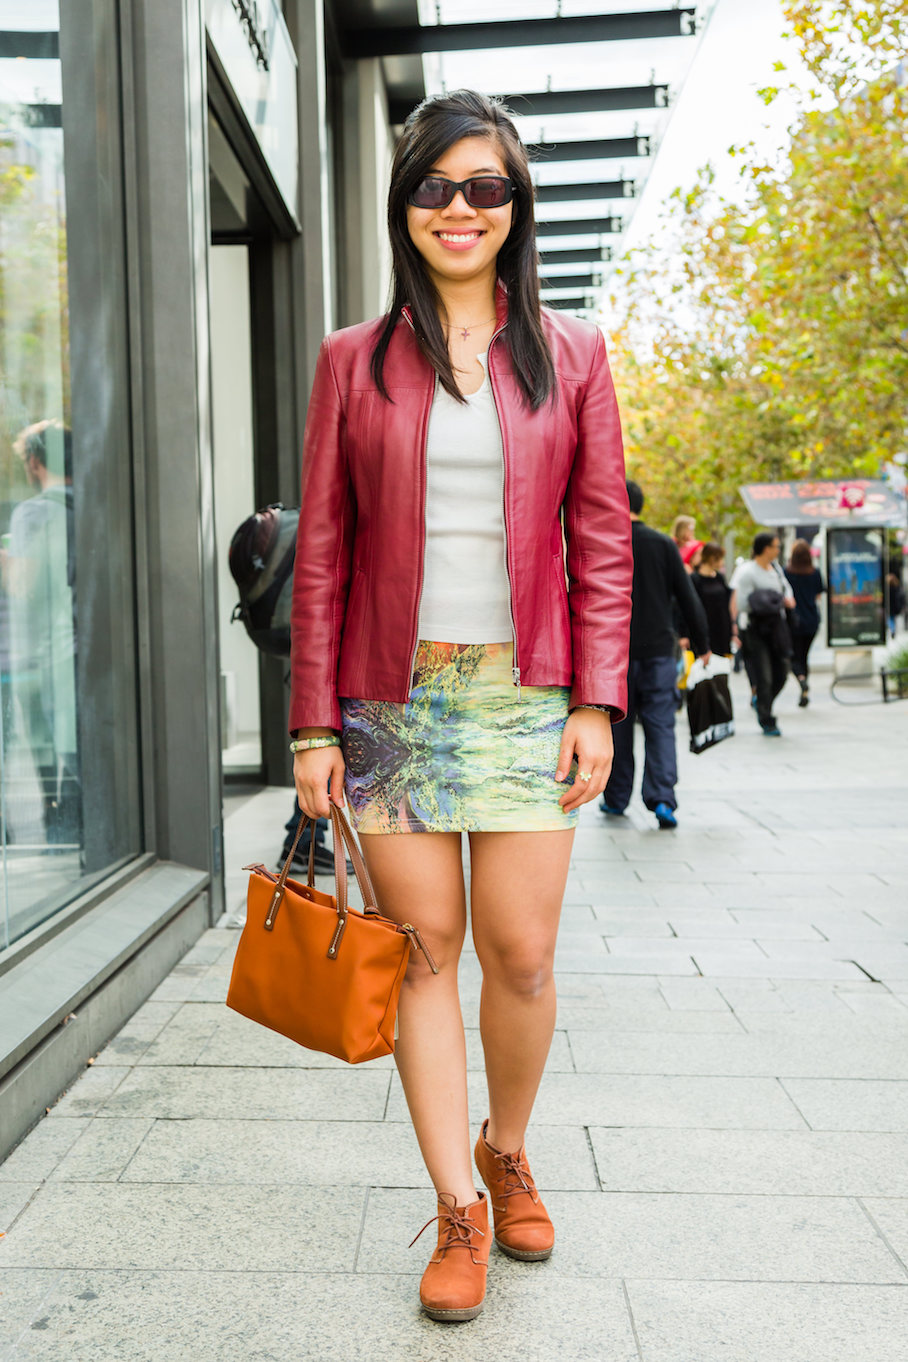 "WA: Joseanne Wong, student, Perth CBD. ""I like to wear colour."" Photo: <a href=""http://www.rahstudios.com.au/street-style.html/"" target=""_blank"">Alain Quah</a>"